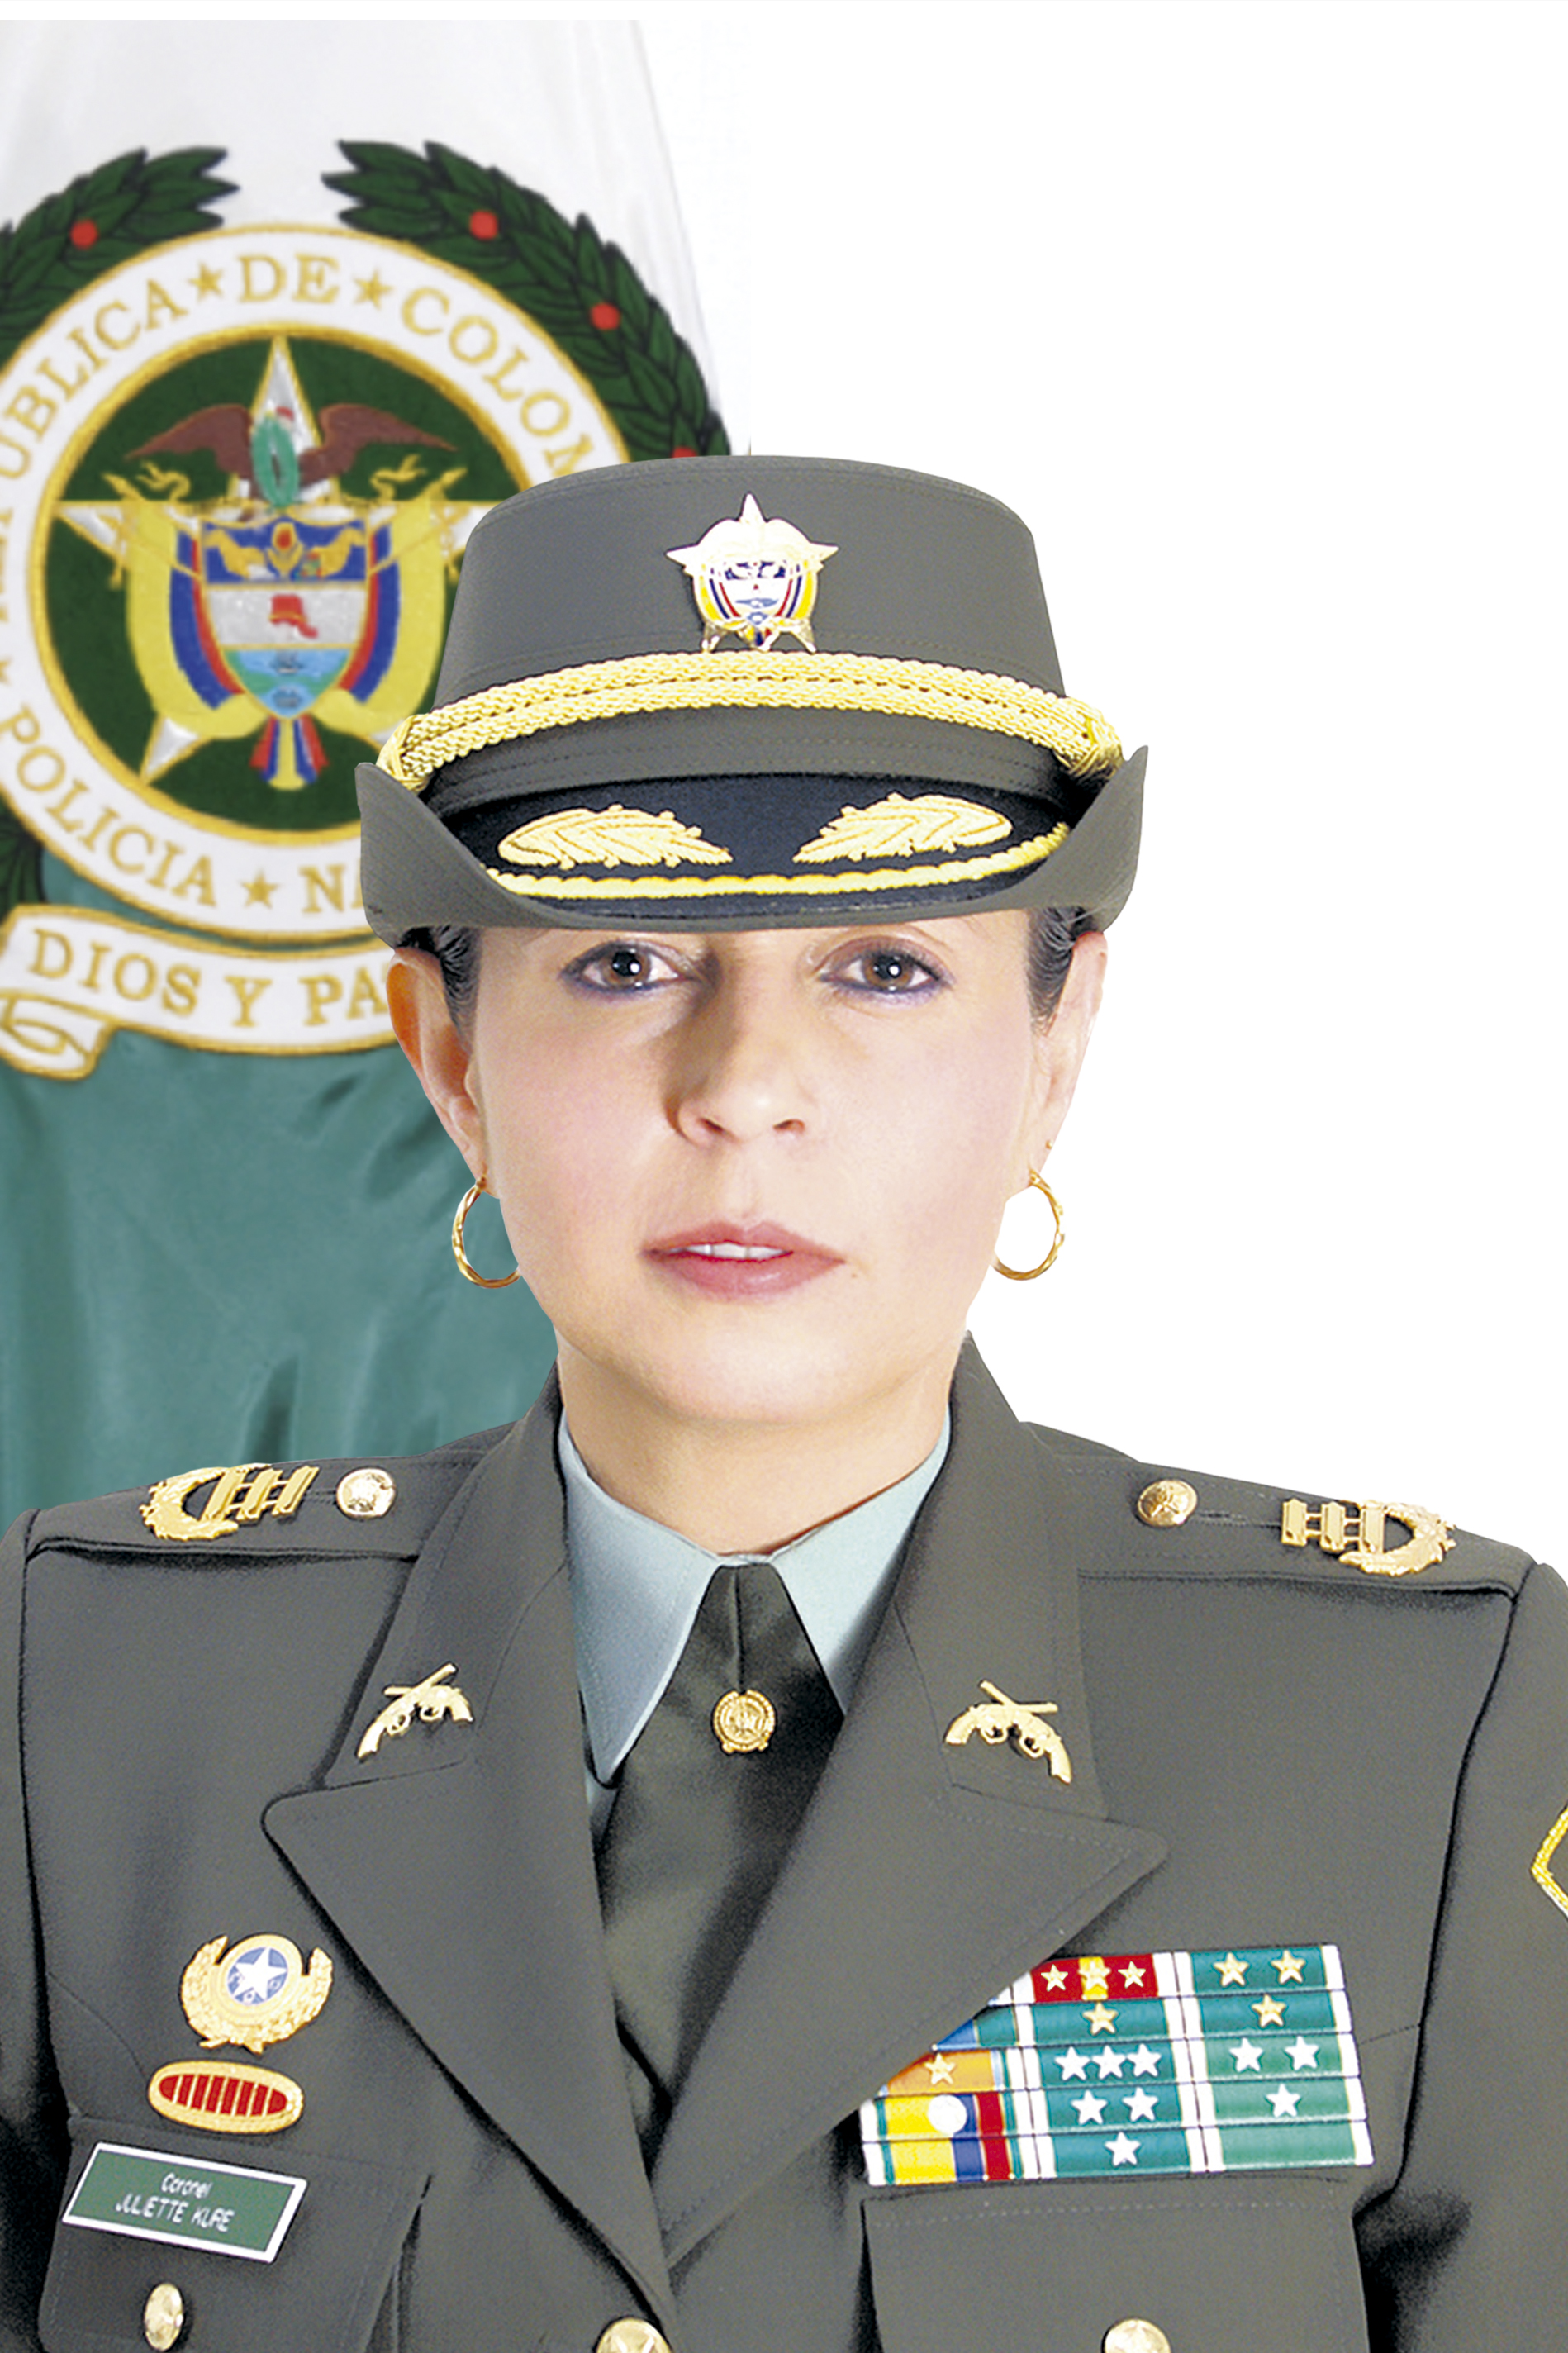 Directora de incorporaci n for Oficina policia nacional